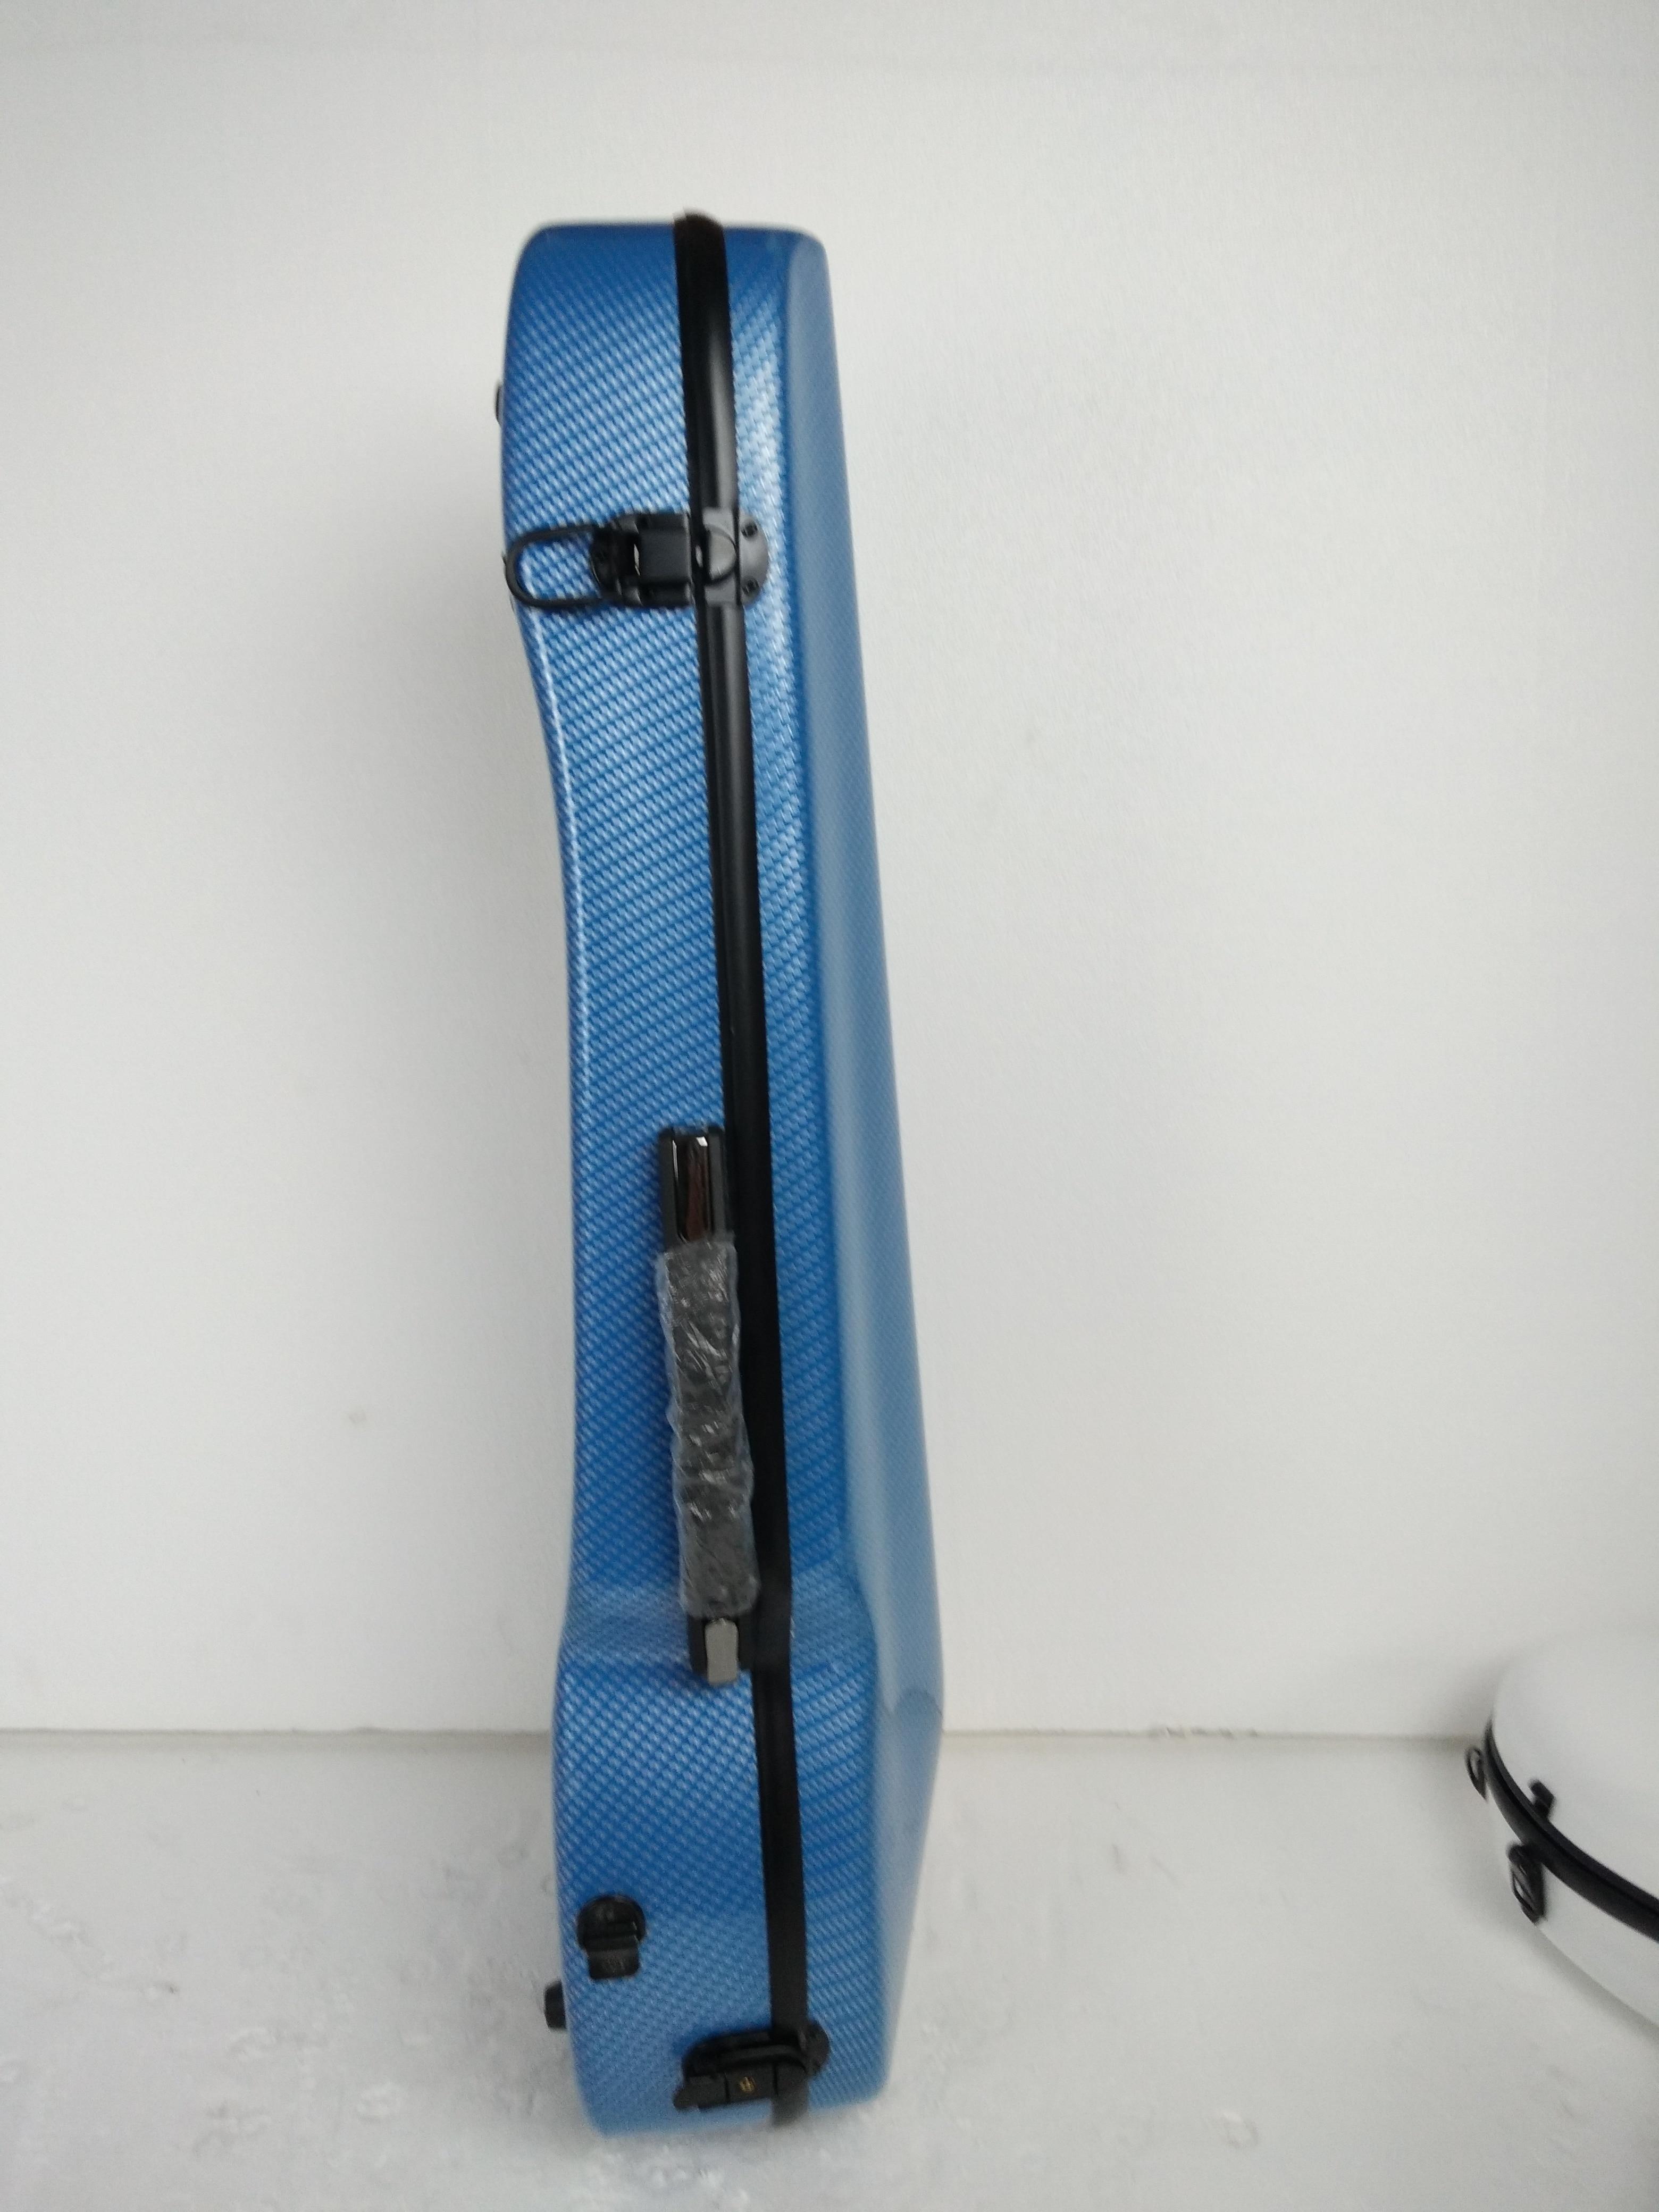 One music bag dark 16 дюймов viola чехол из стекловолокна мягкая имитация кожи